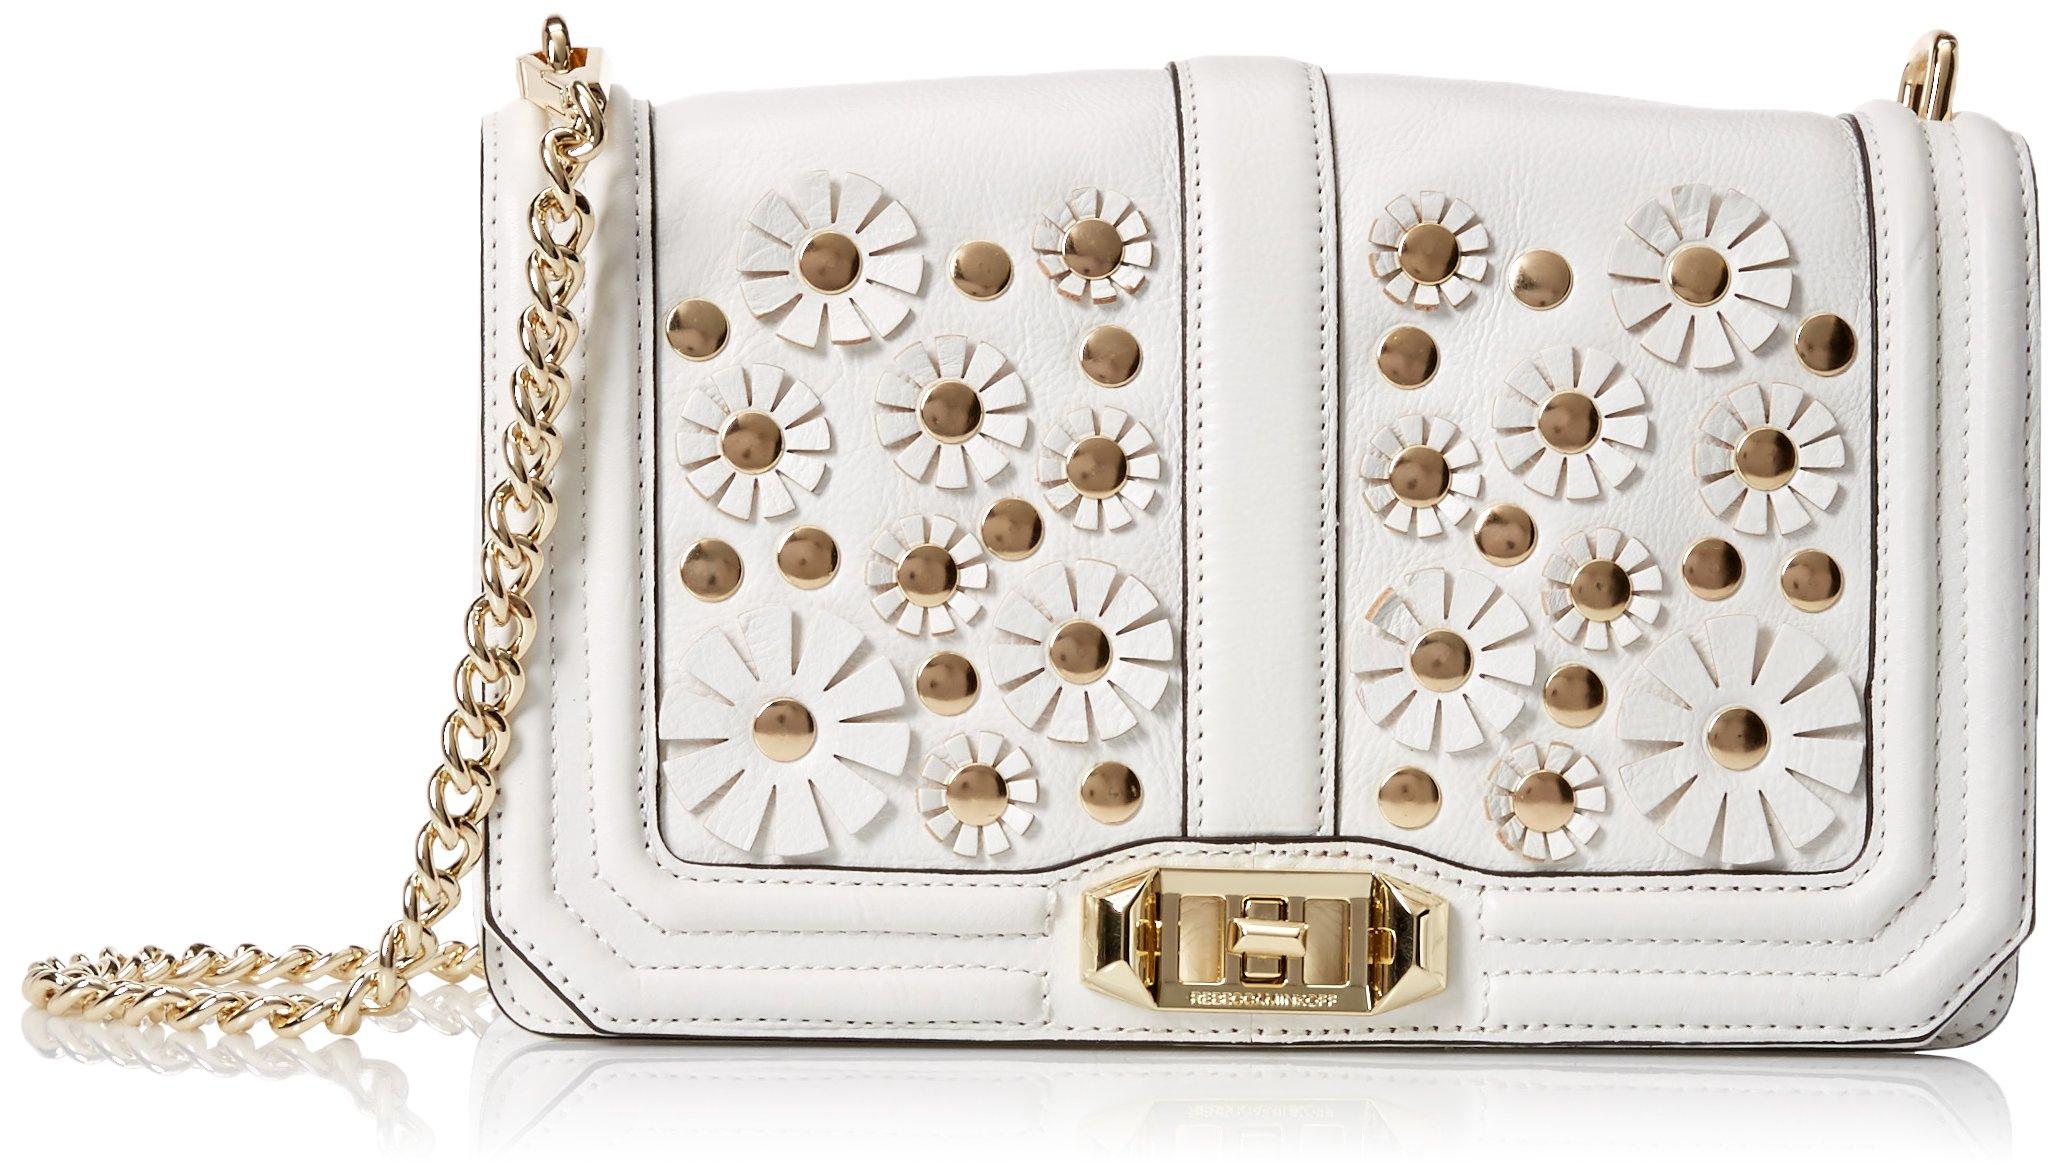 Rebecca Minkoff Love Crossbody Shoulder Bag, White, One Size